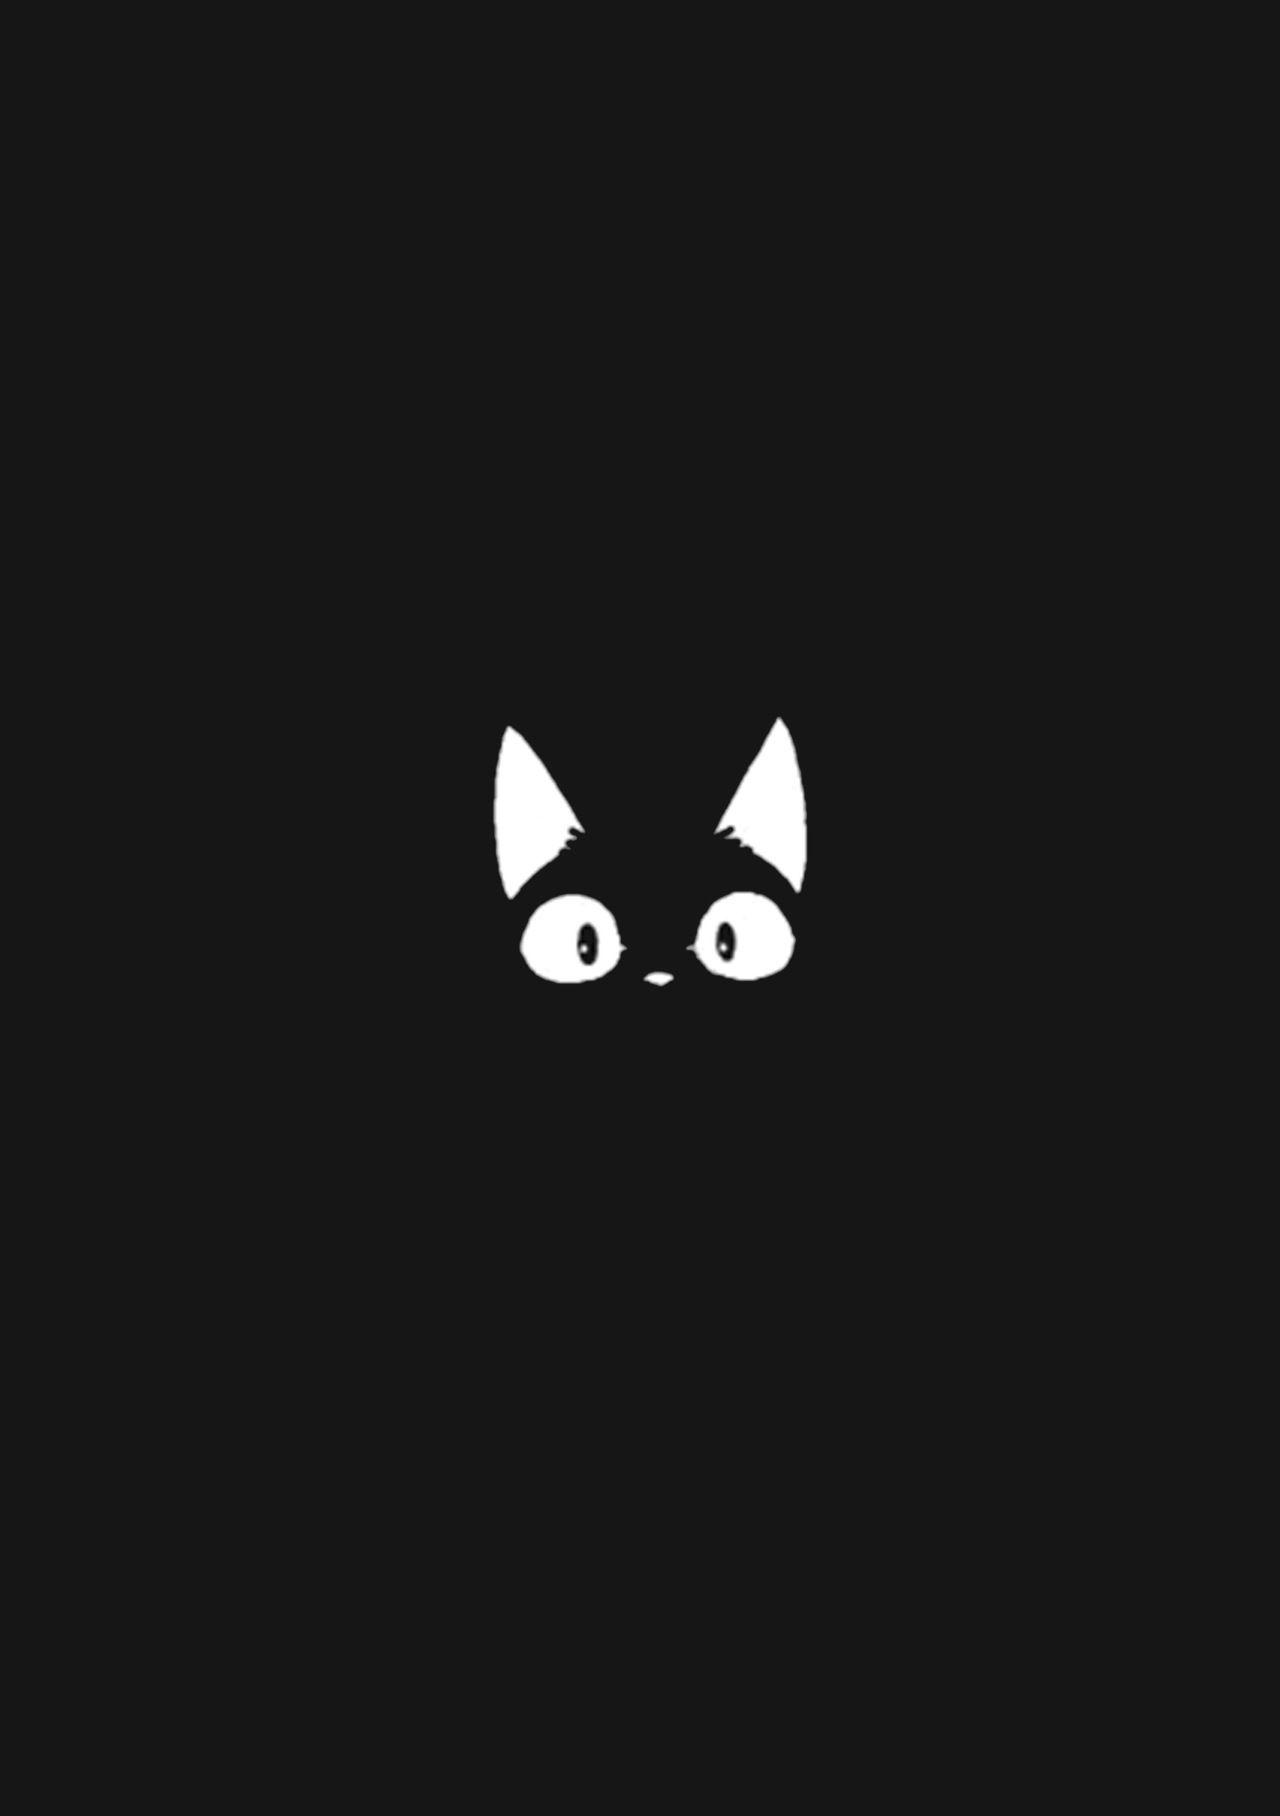 Love black cats 15 quick and cute diy ideas for black cat lovers oc ᵗᵉᶜ pinterest